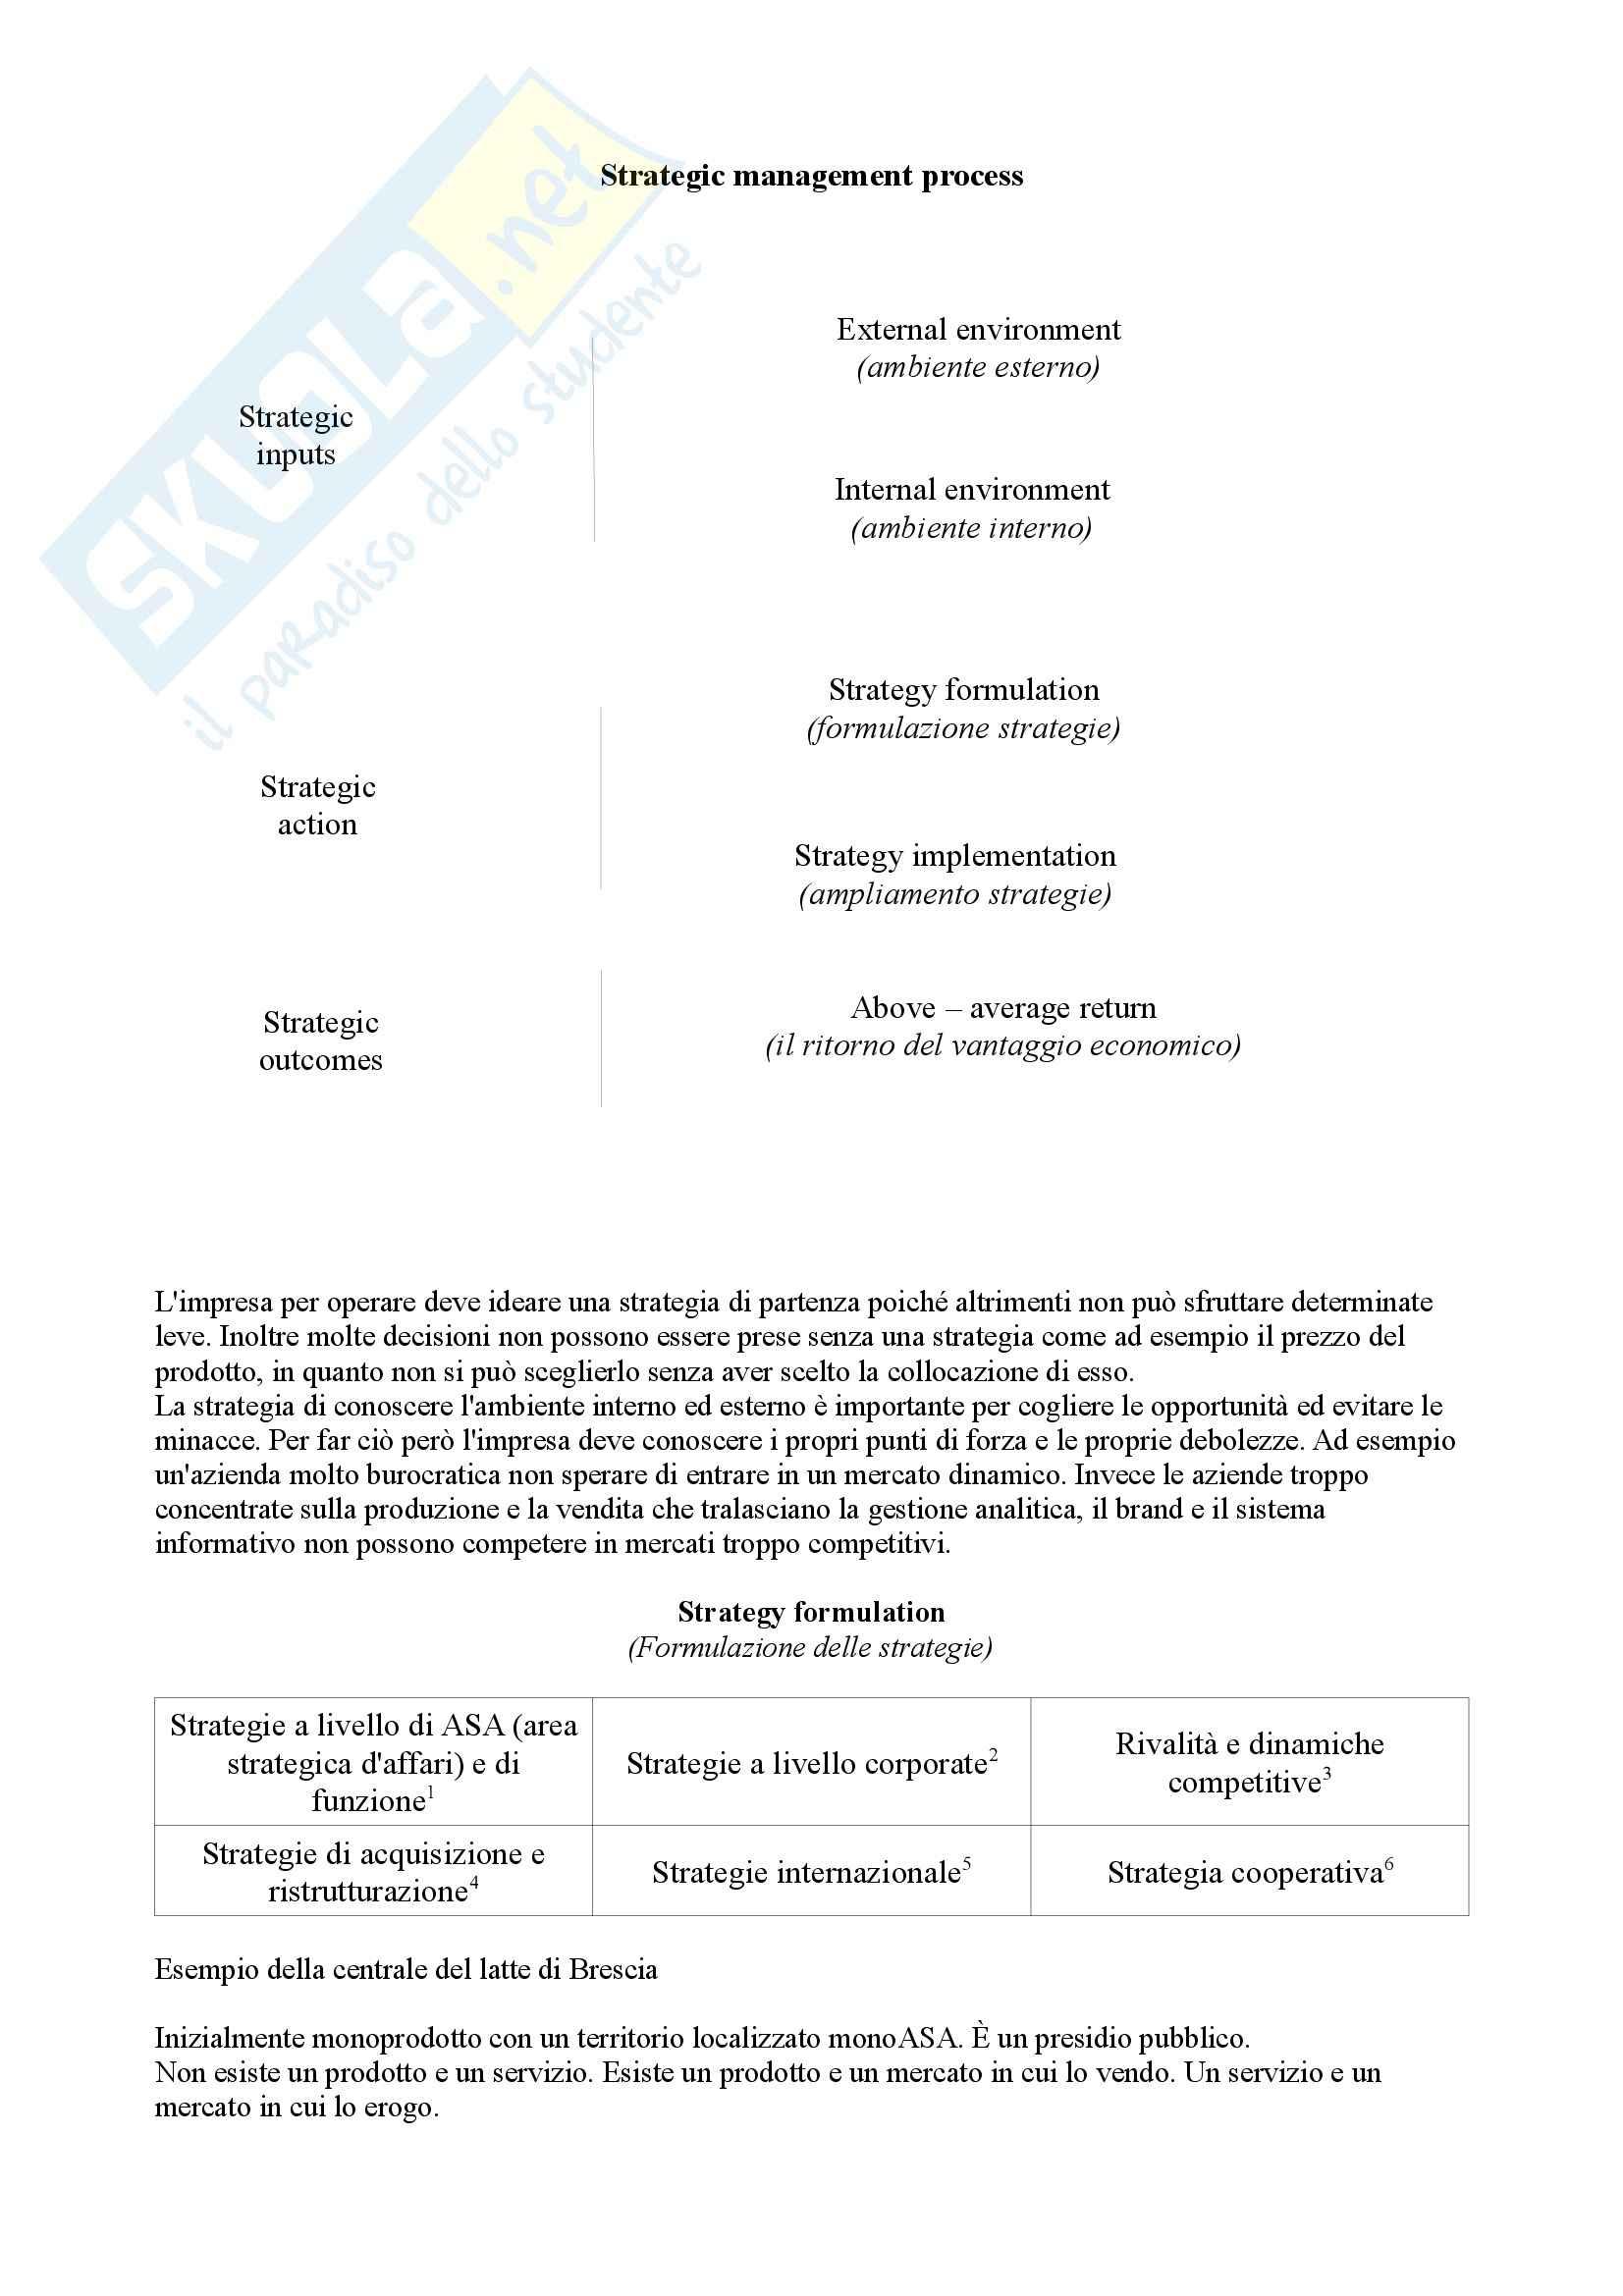 Market - Driven Management II - Appunti prova parziale